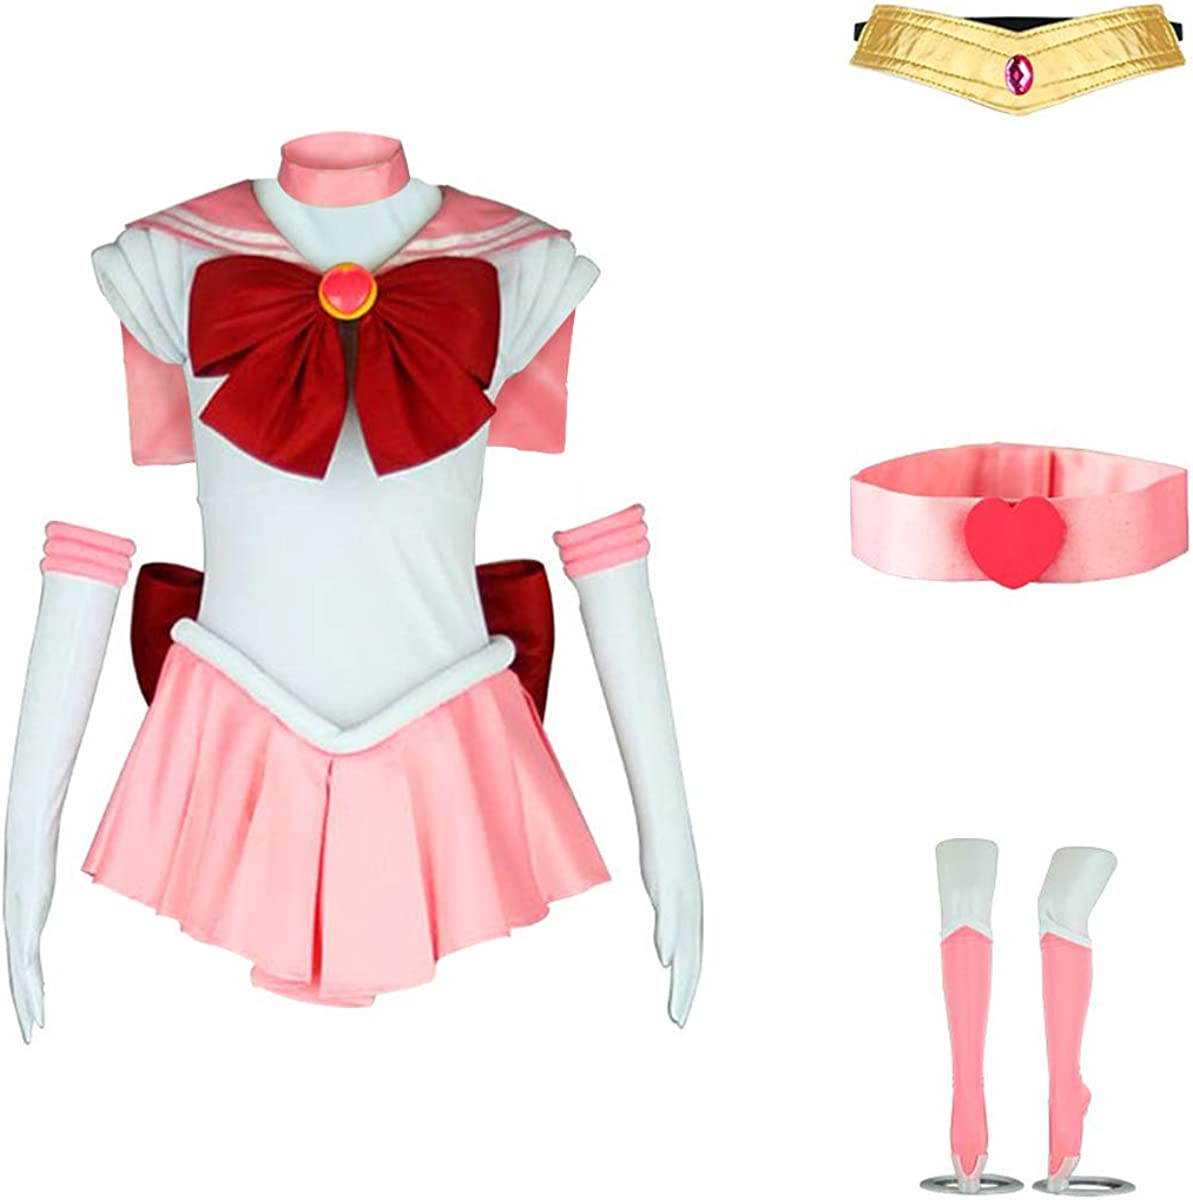 New Chibiusa Sailor Chibi Moon Lolita Cosplay Pink Party Wig Short Women/'s Wig